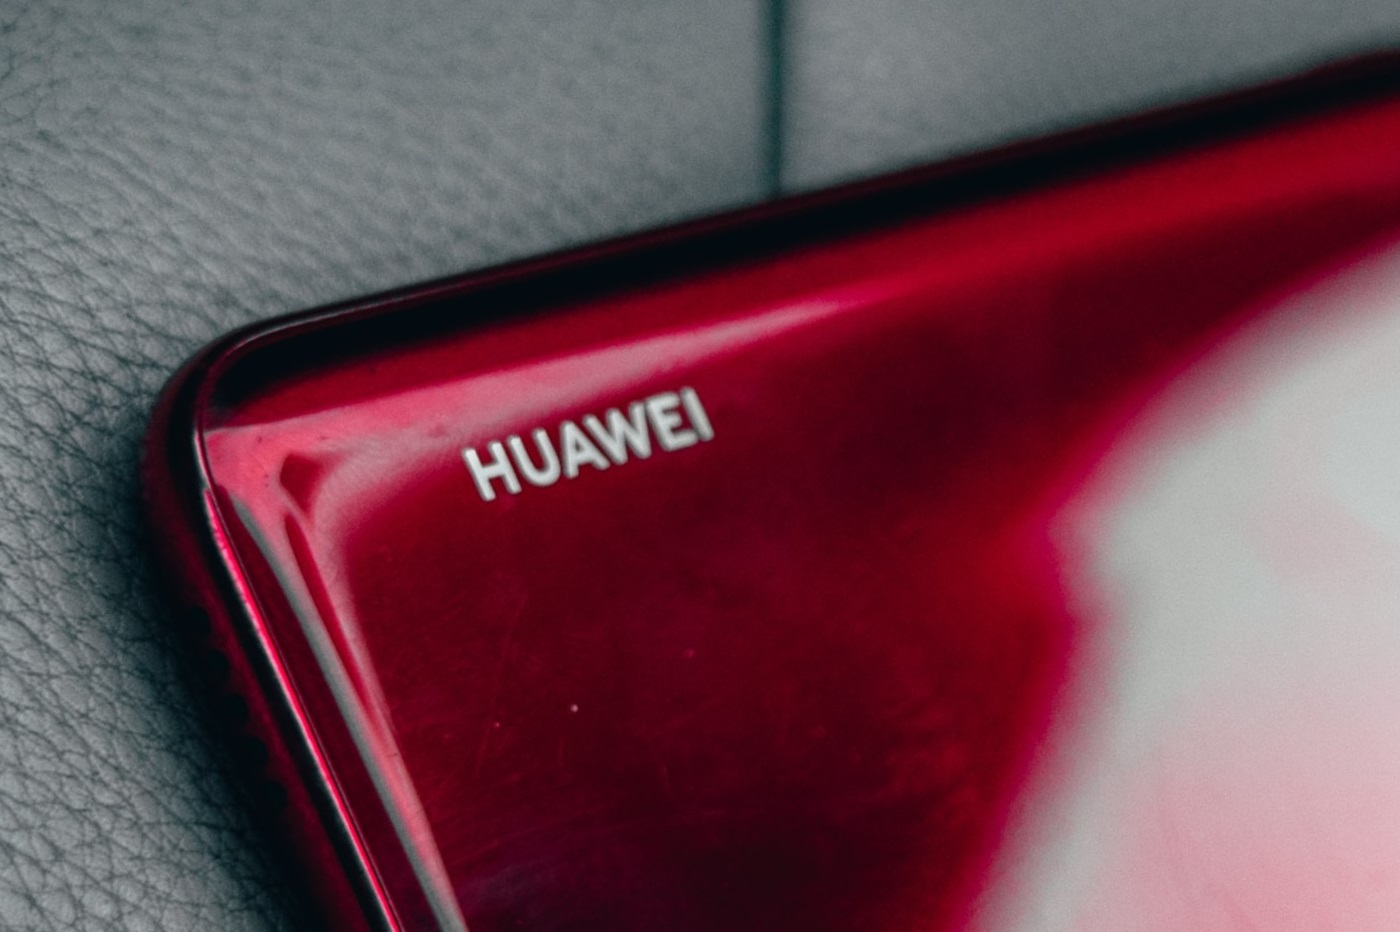 La marque Huawei sur le dos d'un smartphone